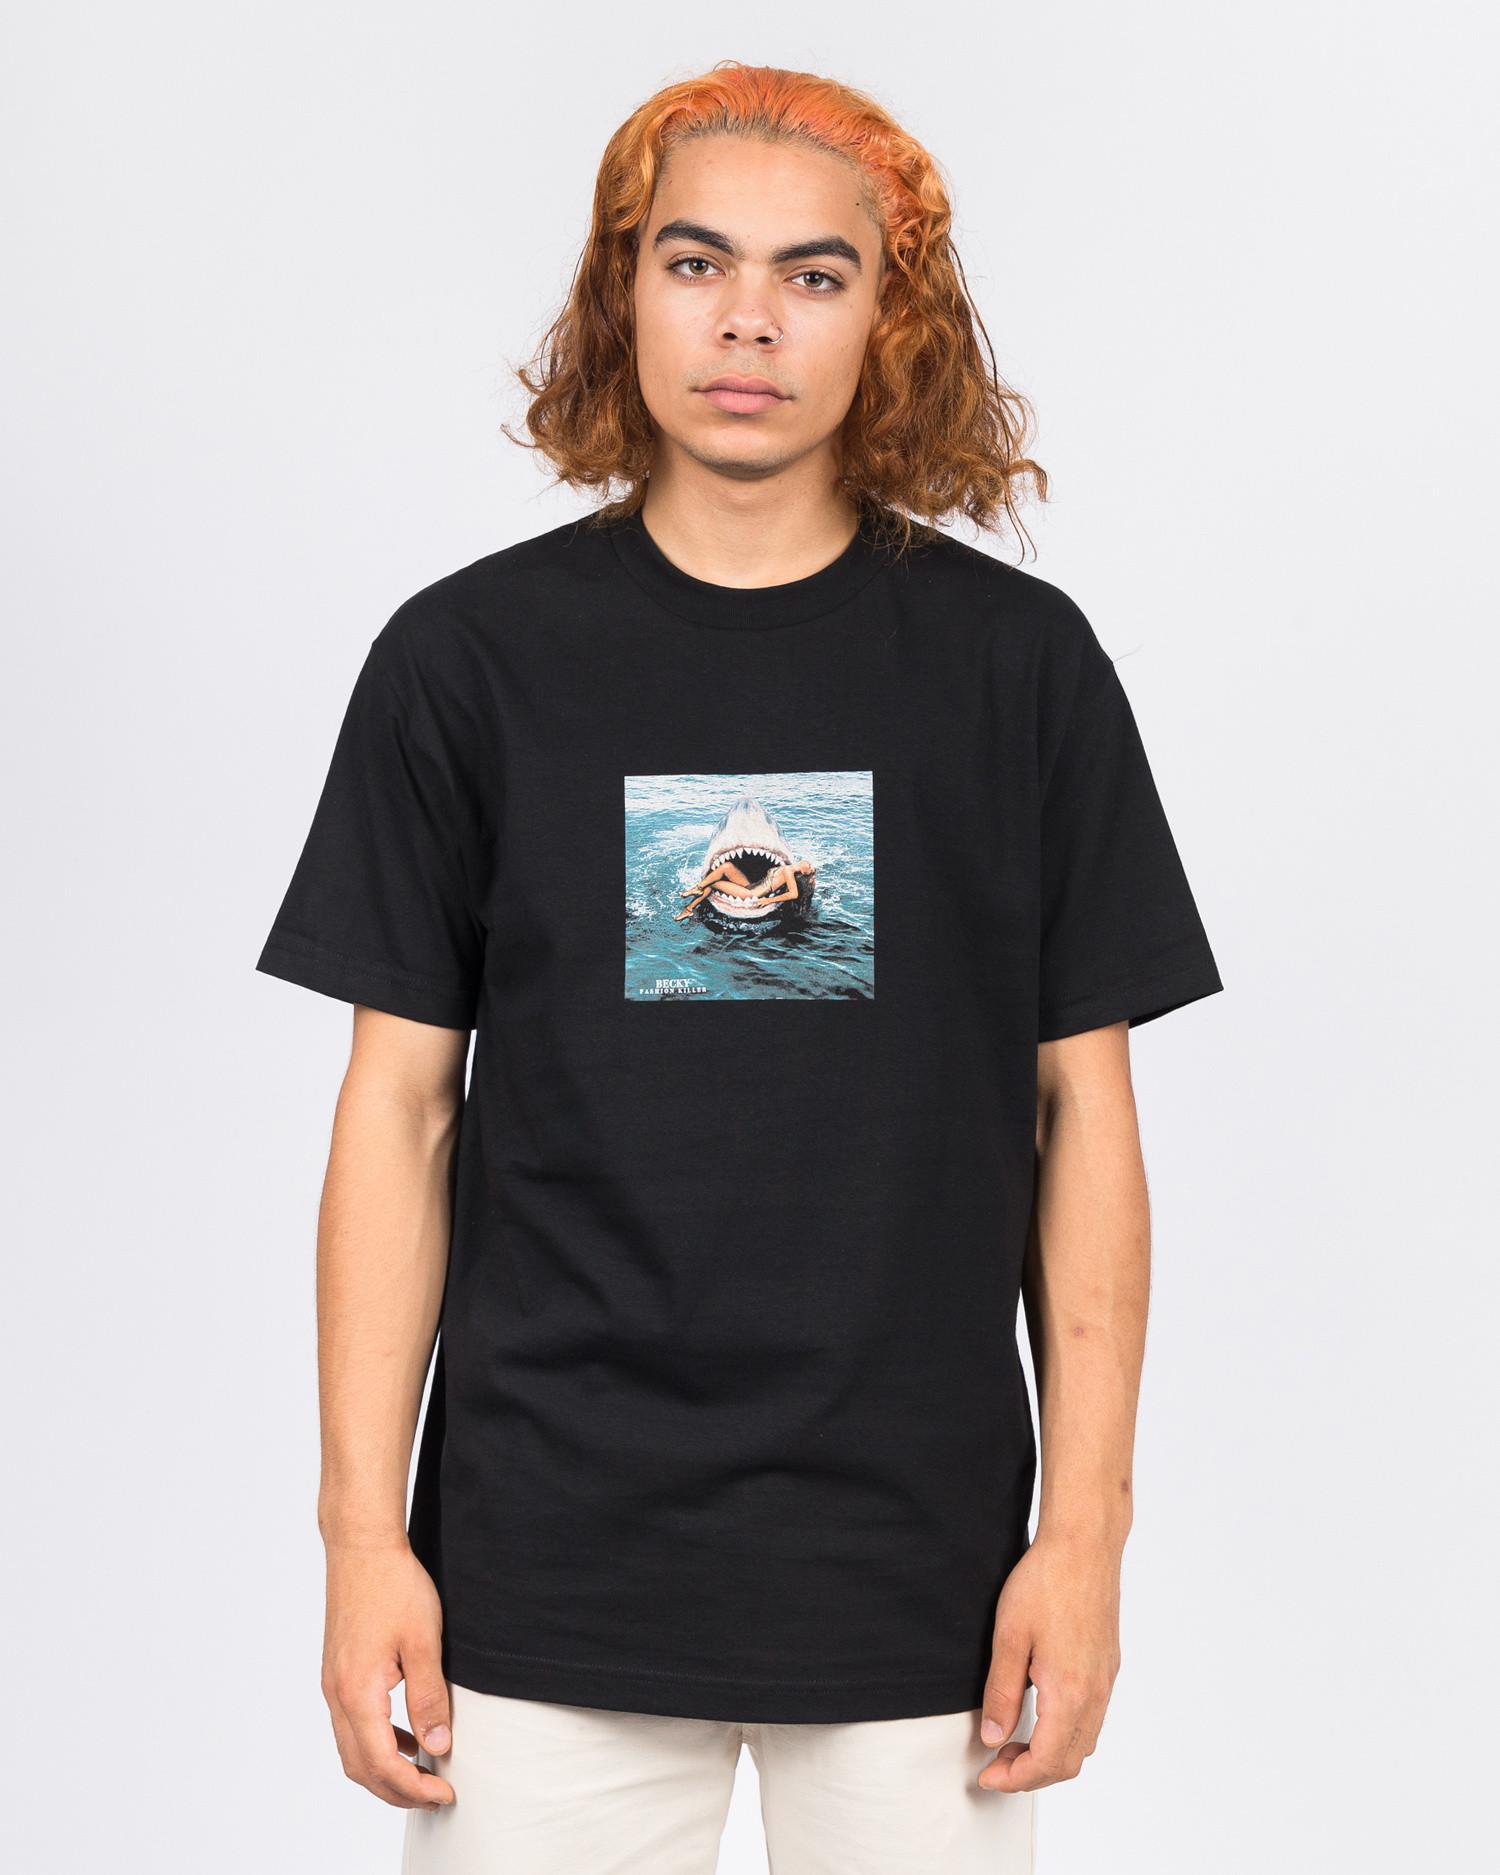 Becky Fashion Killer Shark T-Shirt Black